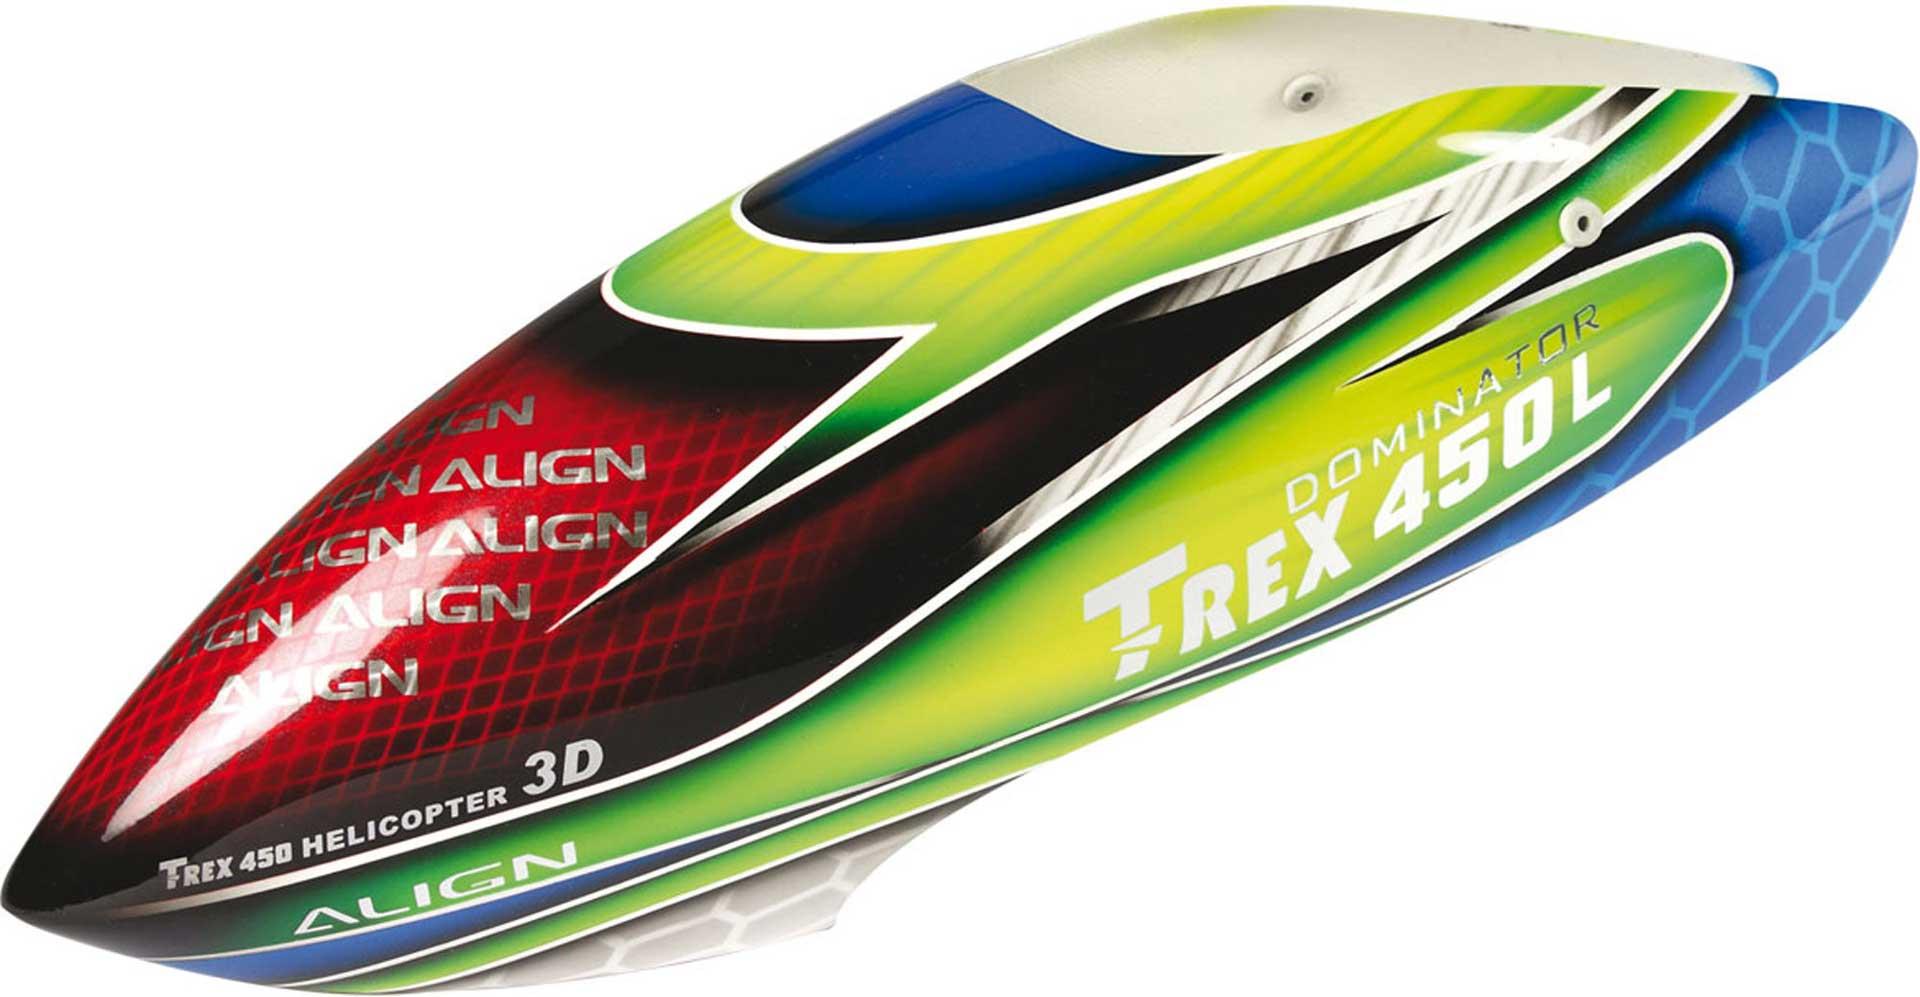 ALIGN CANOPY T-REX 450 L